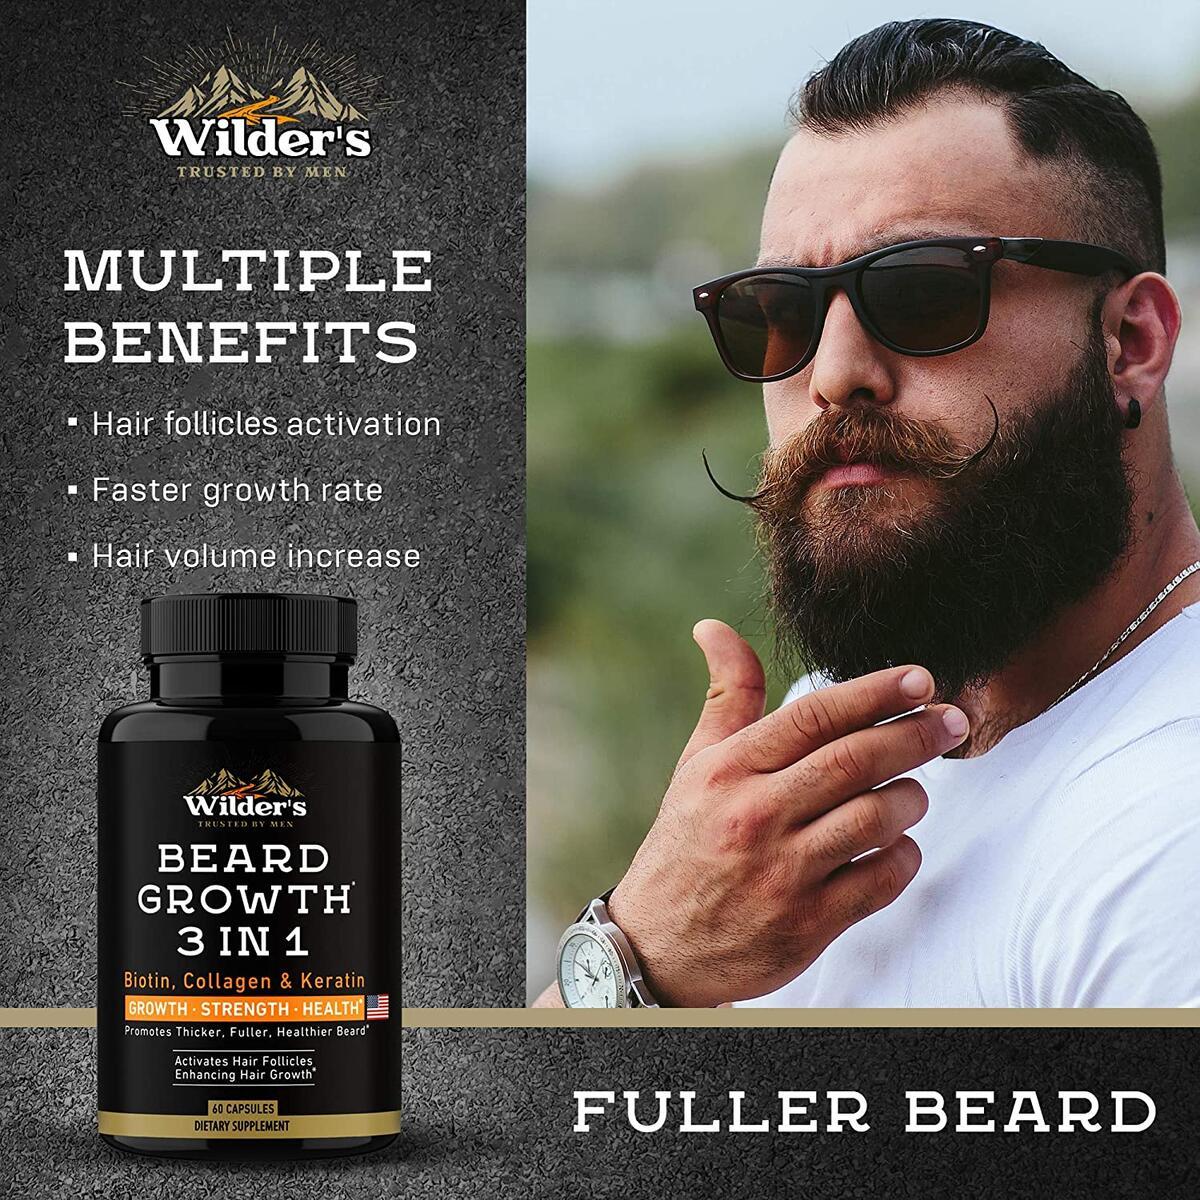 Mens Beard Growth Pills - Thin & Patchy Beard Enhancement Supplement - Made in USA - 60 Capsules - MSM, Biotin, Collagen, Keratin Beard Vitamins - Facial Hair Growth Supplement - Beard Pills for Men